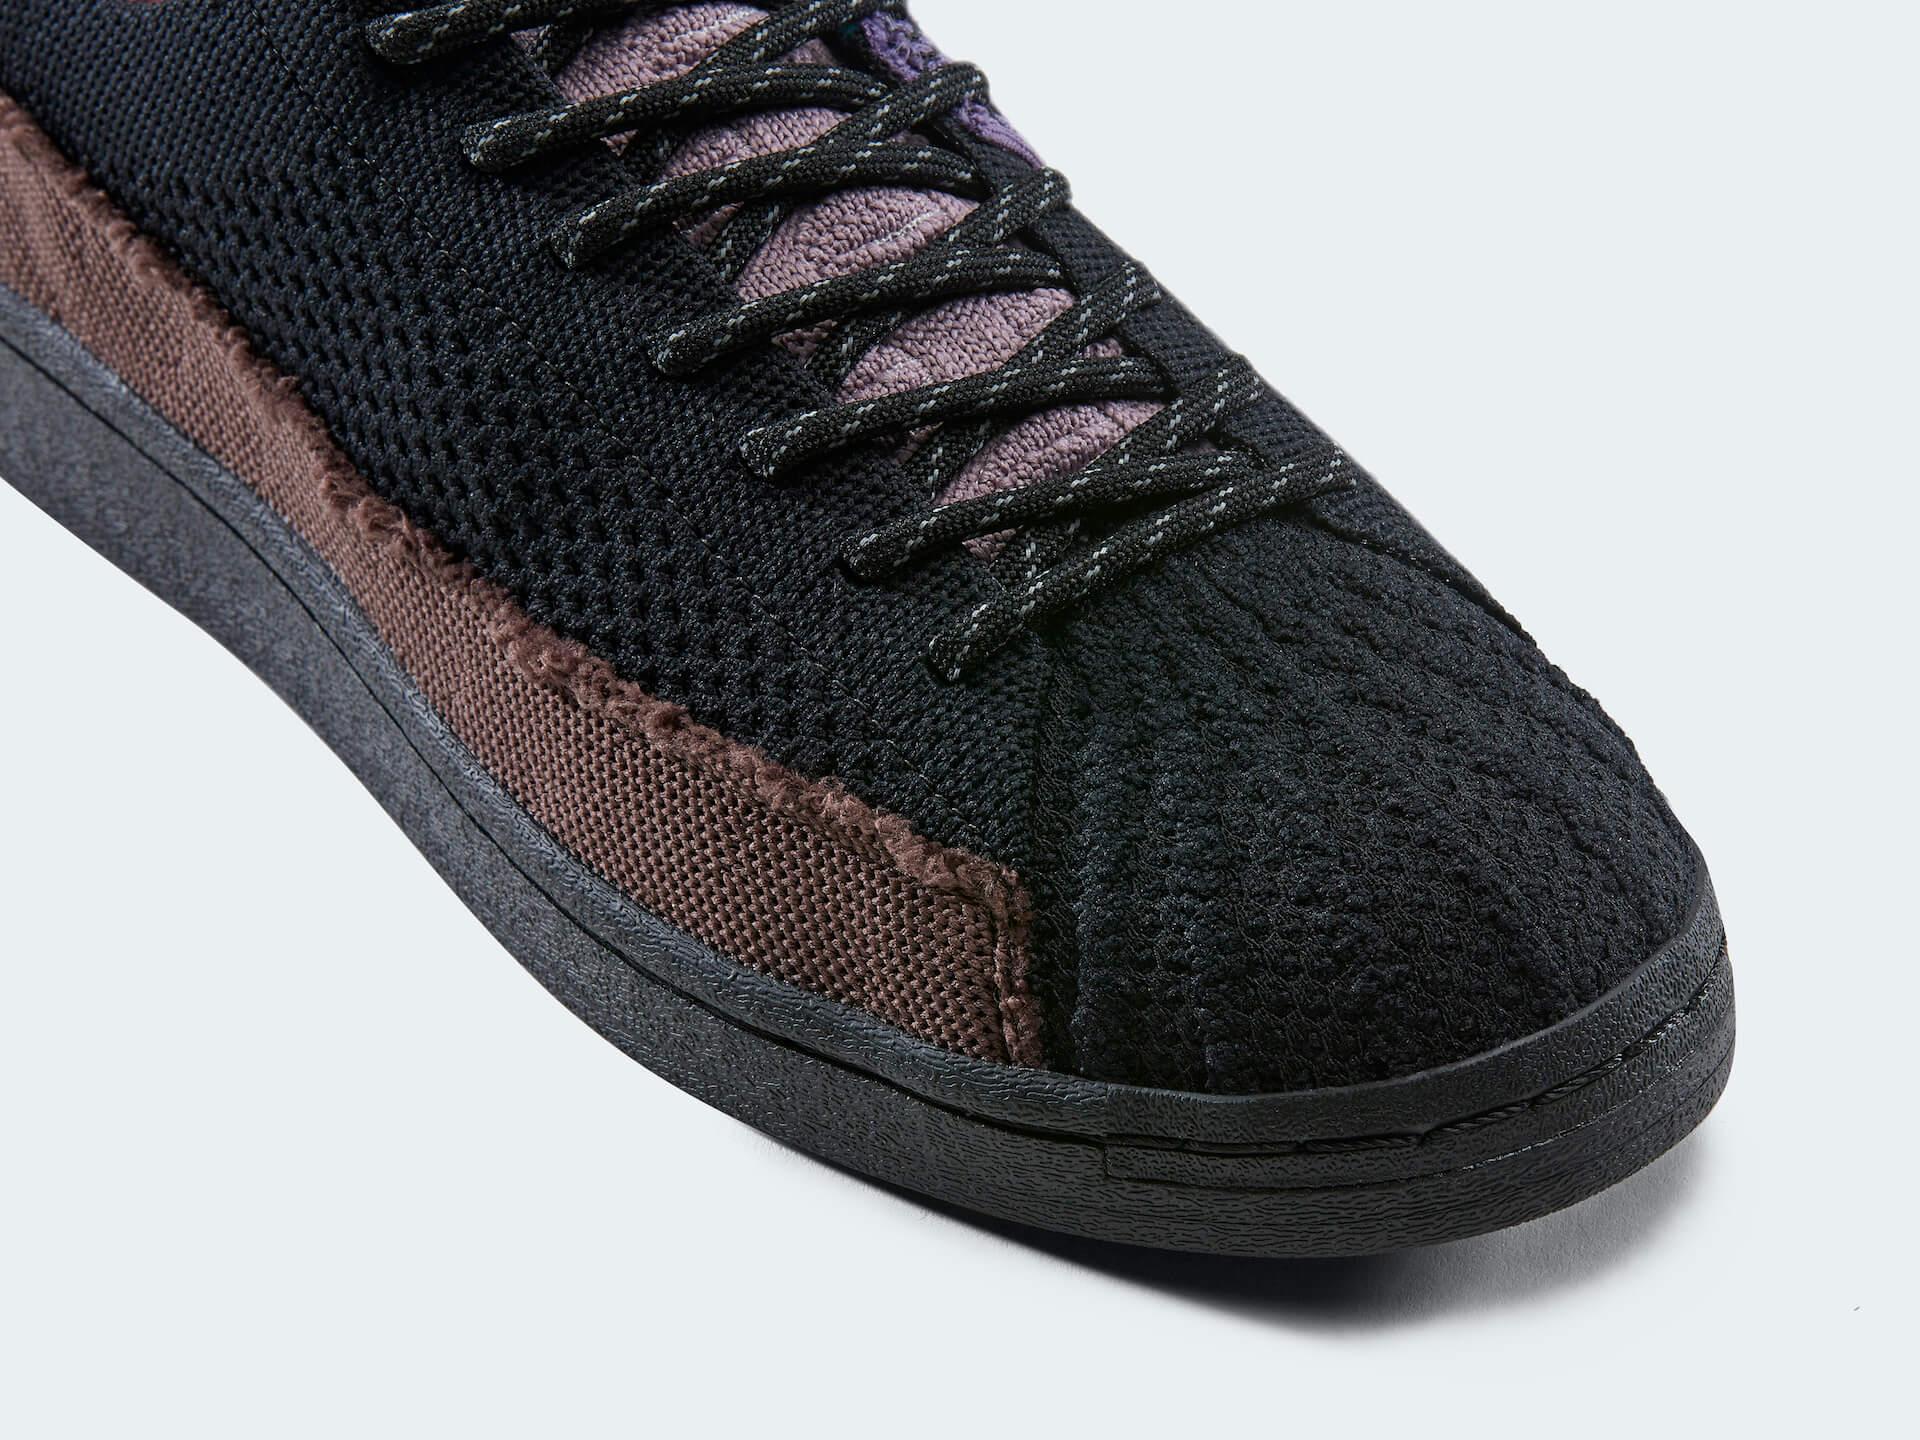 adidas Originalsとファレル・ウィリアムスのコラボ『SUPERSTAR』が登場!パッチワークパネルが目を引くデザイン lf200701_adidasporiginals_pharrelwilliams_08